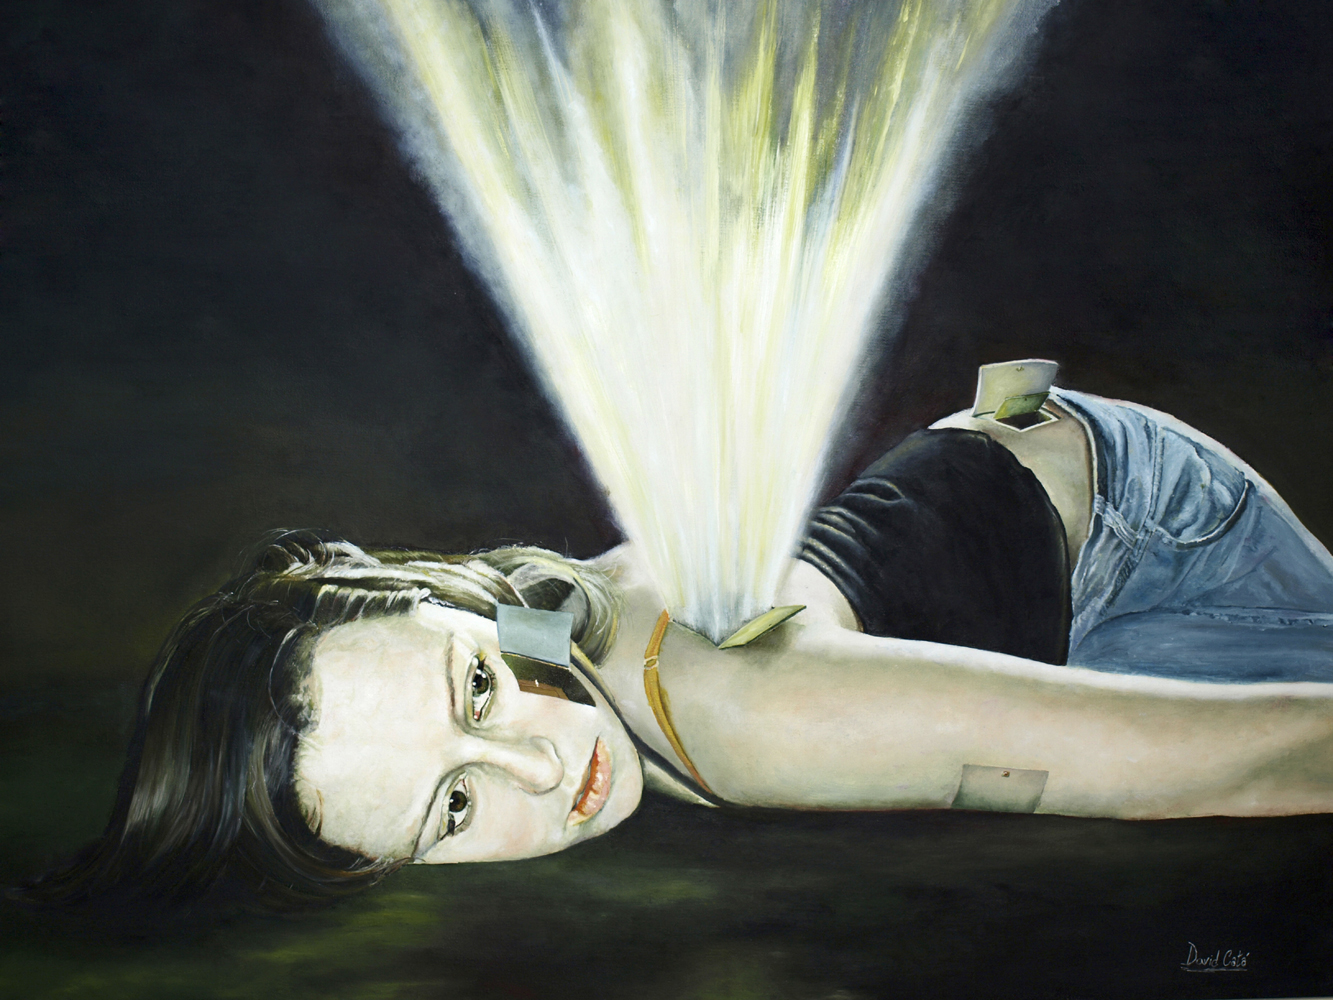 Olvidos Recordados, 2008. Óleo sobre lienzo. 73 x 92 cm.